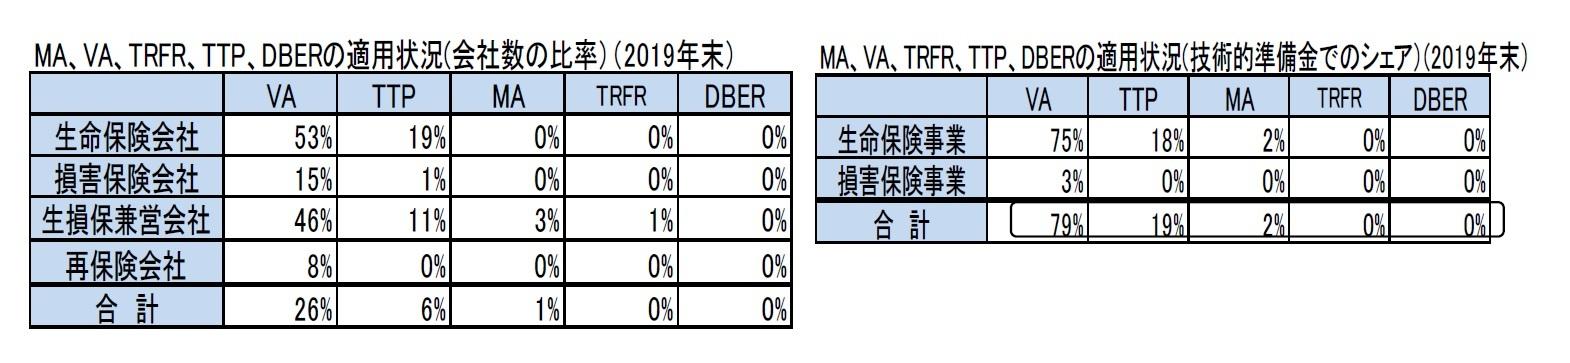 MA、VA、TRFR、TTP、DBERの適用状況(会社数の比率)(2019年末)/MA、VA、TRFR、TTP、DBERの適用状況(技術的準備金でのシェア)(2019年末)